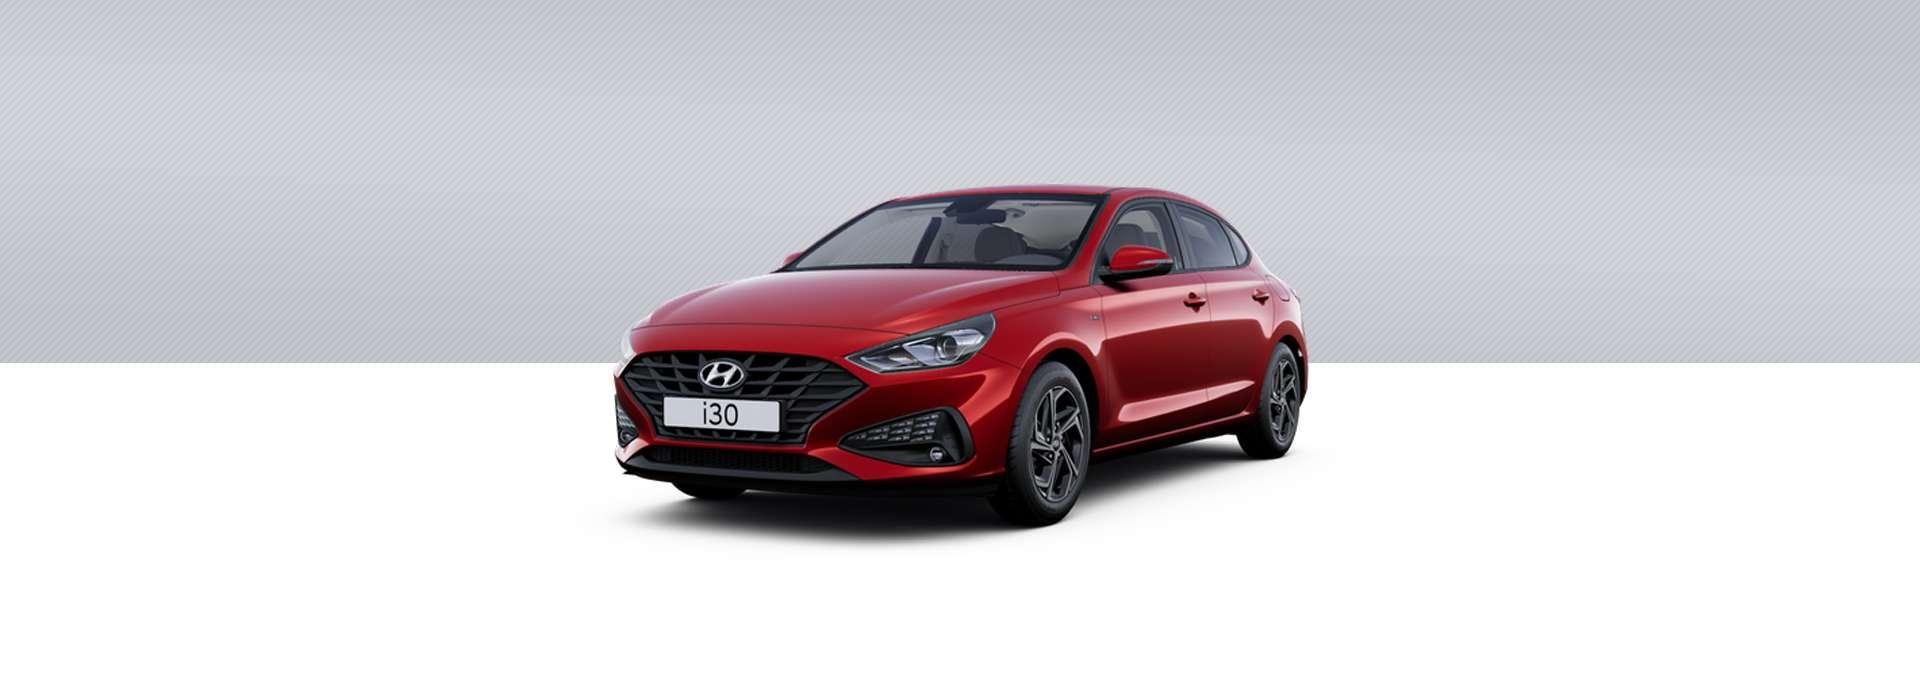 Hyundai Nuevo i30 Fastback